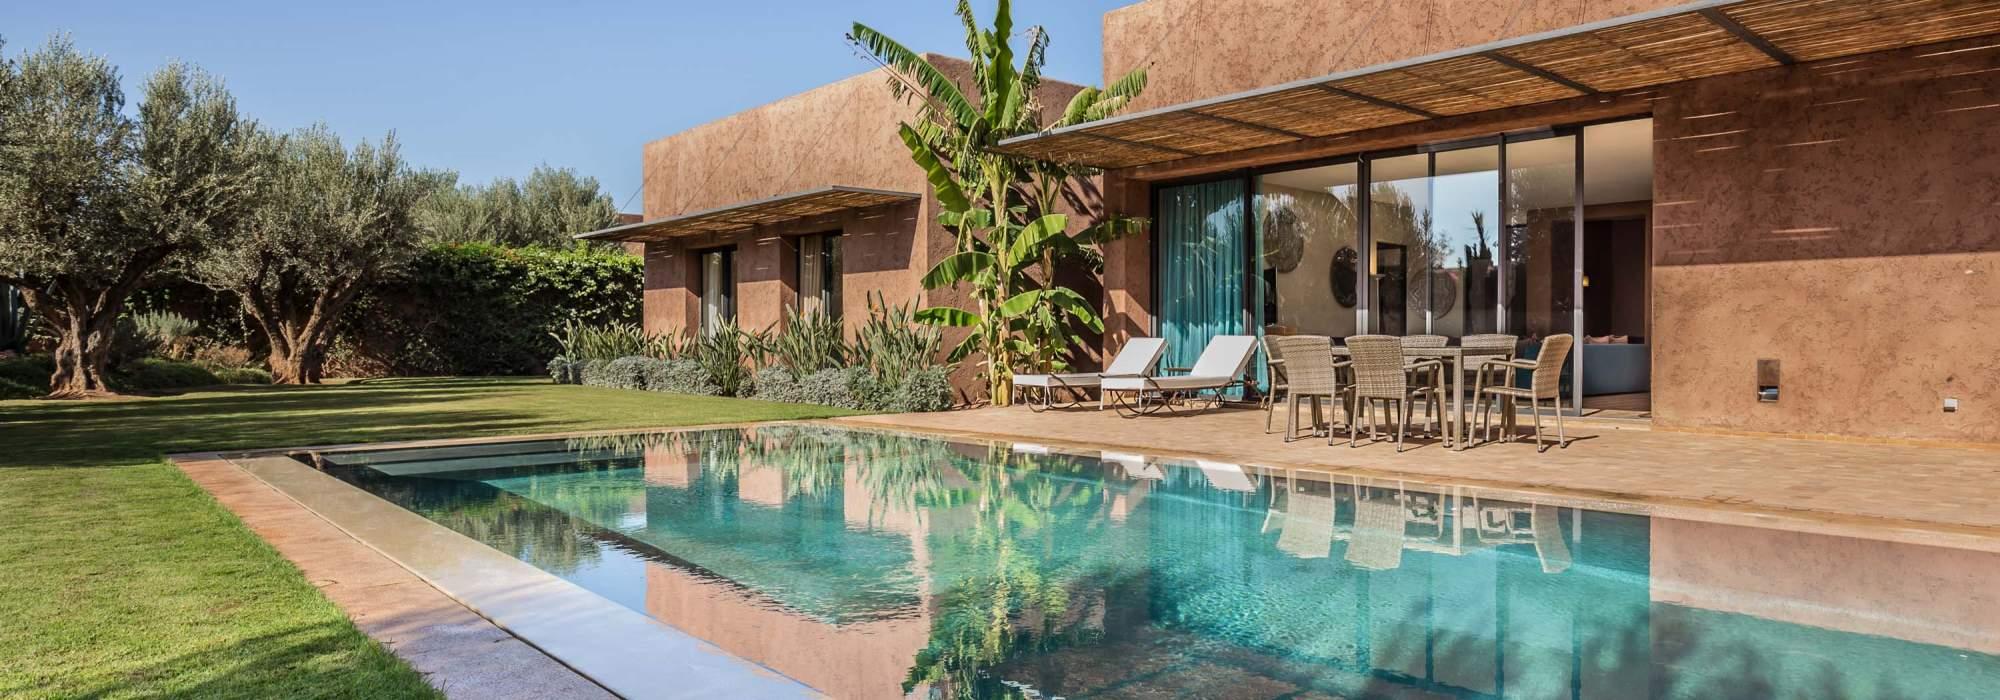 villa a vendre golf marrakech